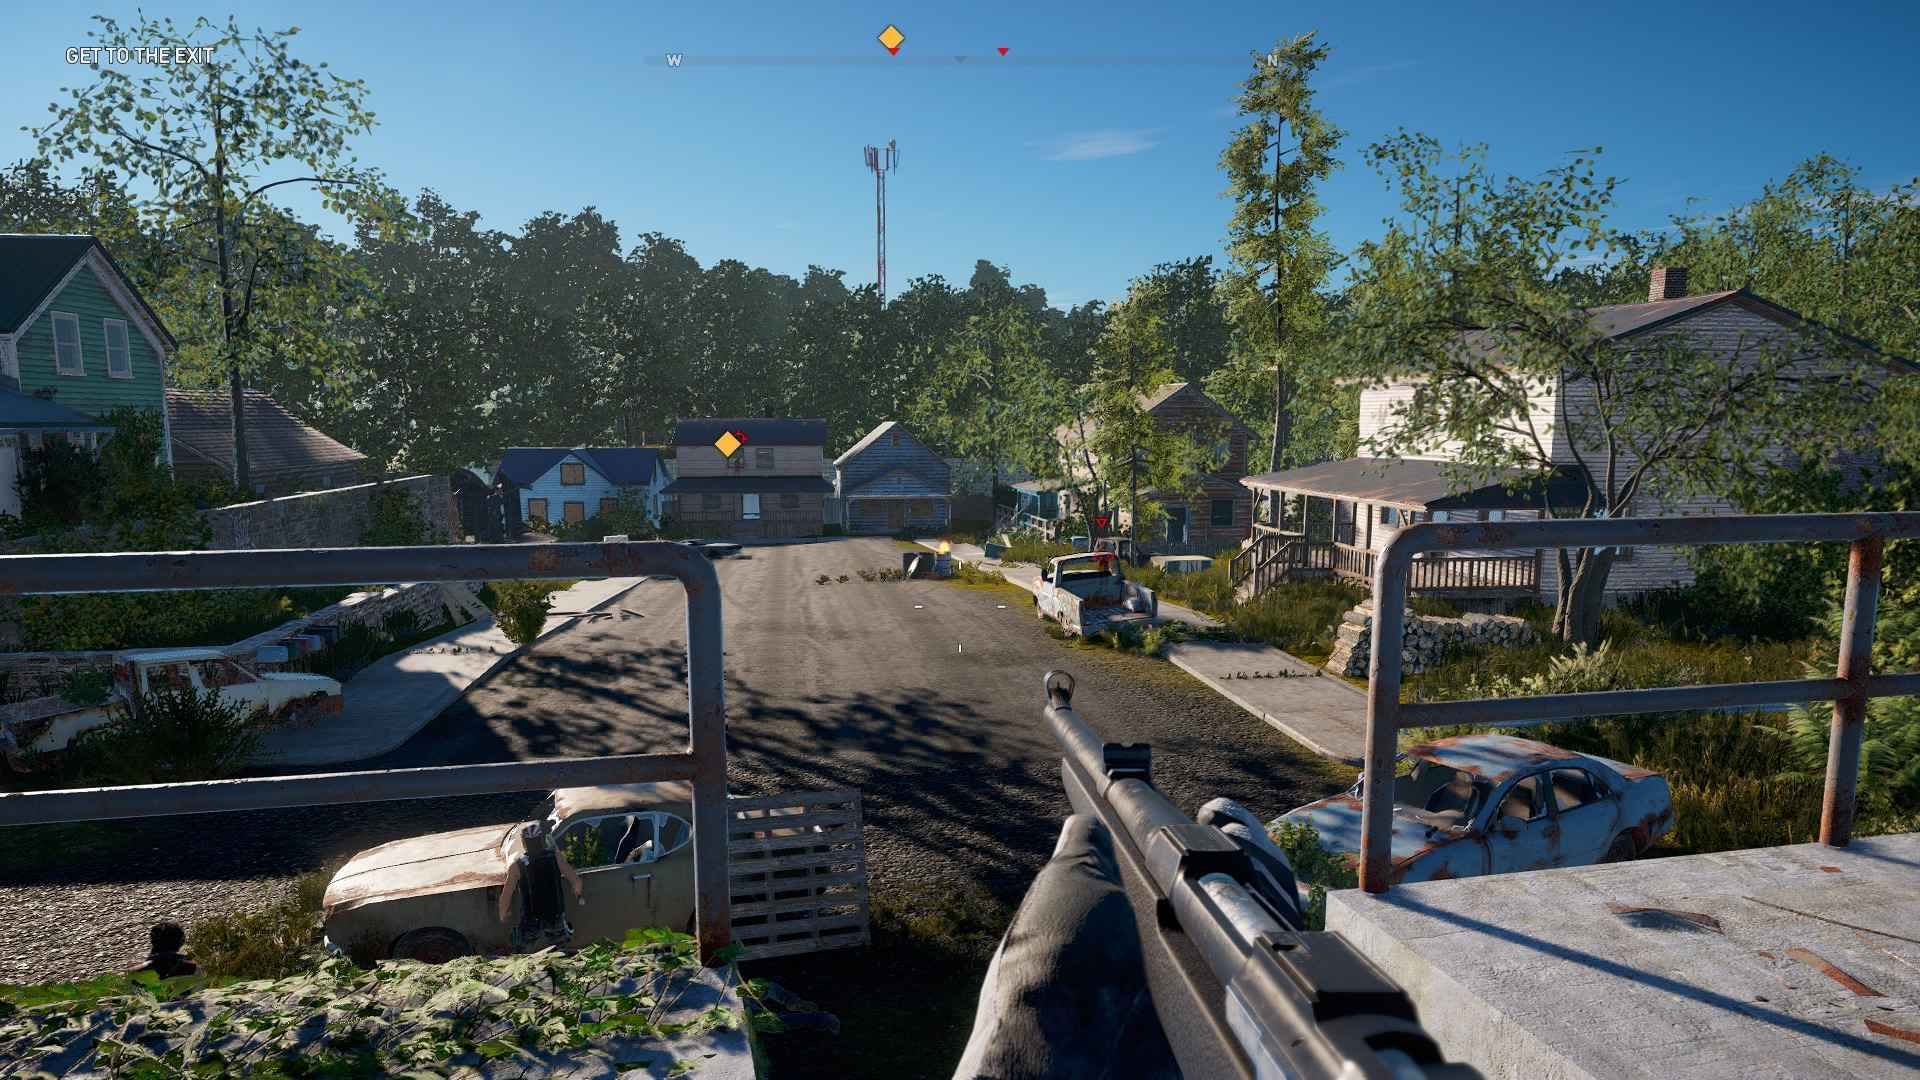 Best Far Cry 5 Arcade Maps Playstation Universe